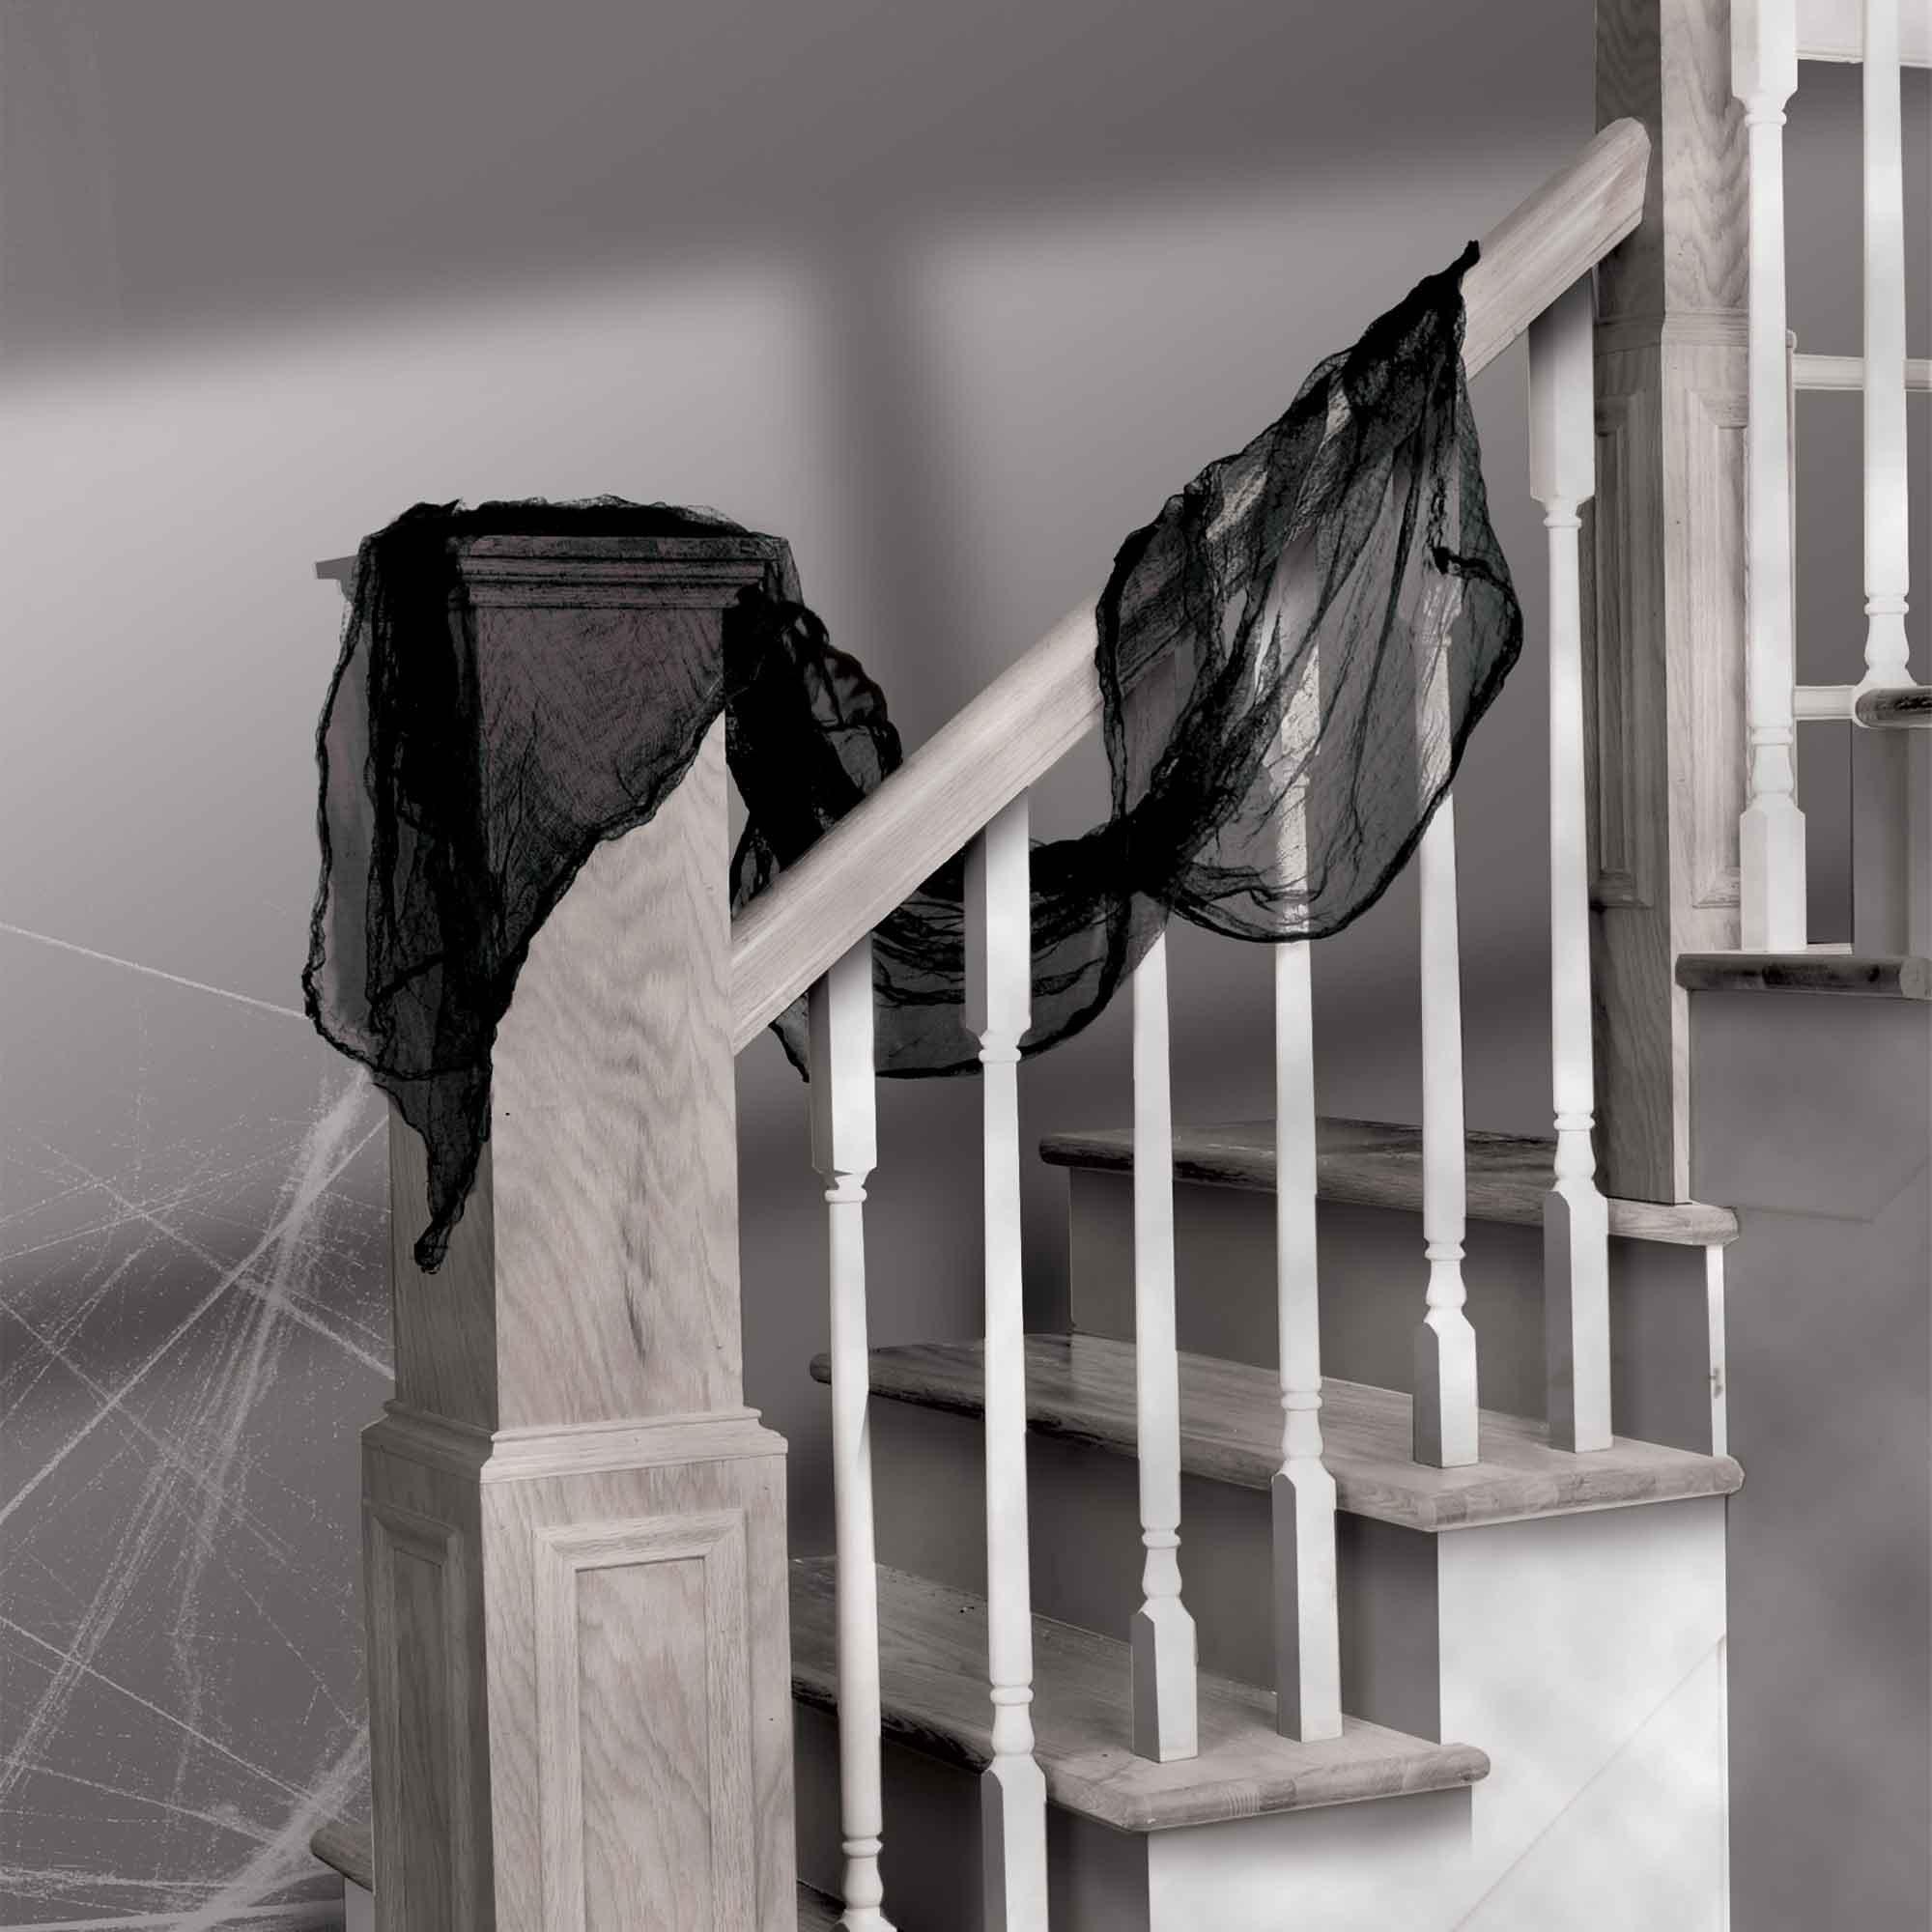 Black Gauze Cloth Decoration